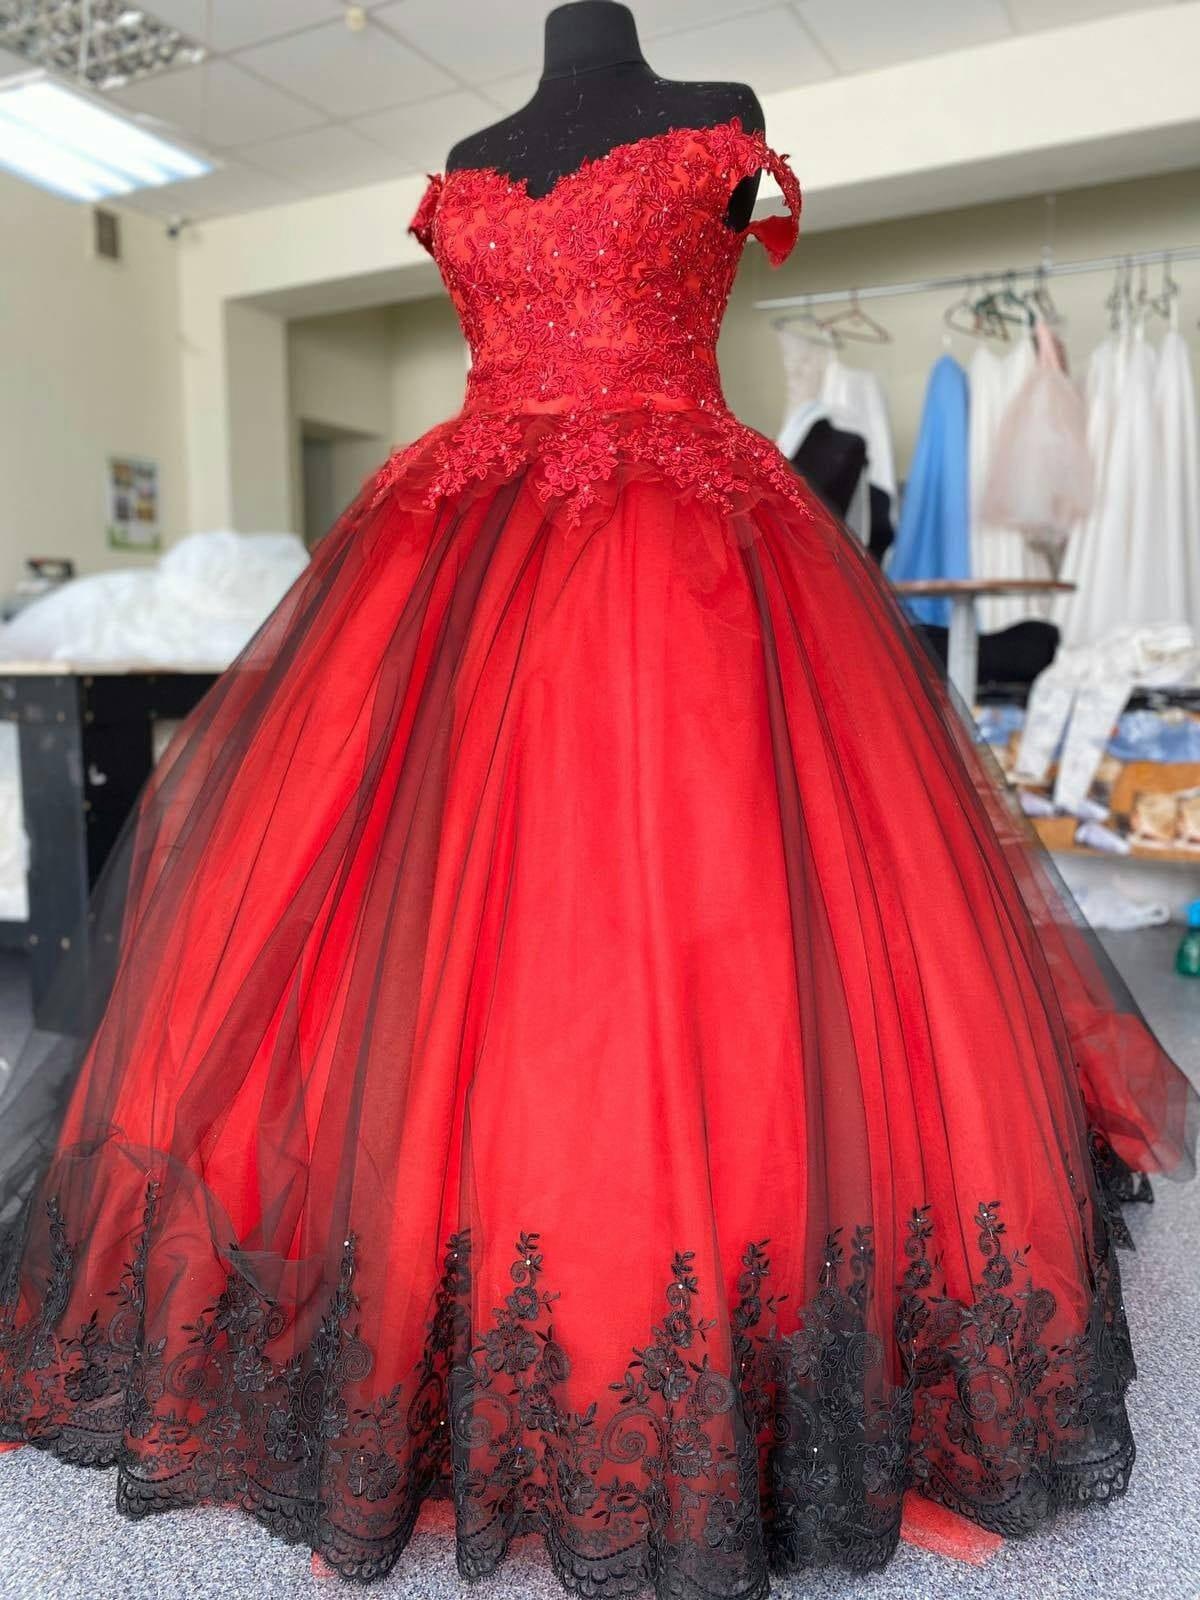 Red Weding Dress Gothic Wedding Dress Black Wedding Dress Gothic Ball Gown  Alternative Wedding Dress Black Lace Wedding Dress Lux Dress